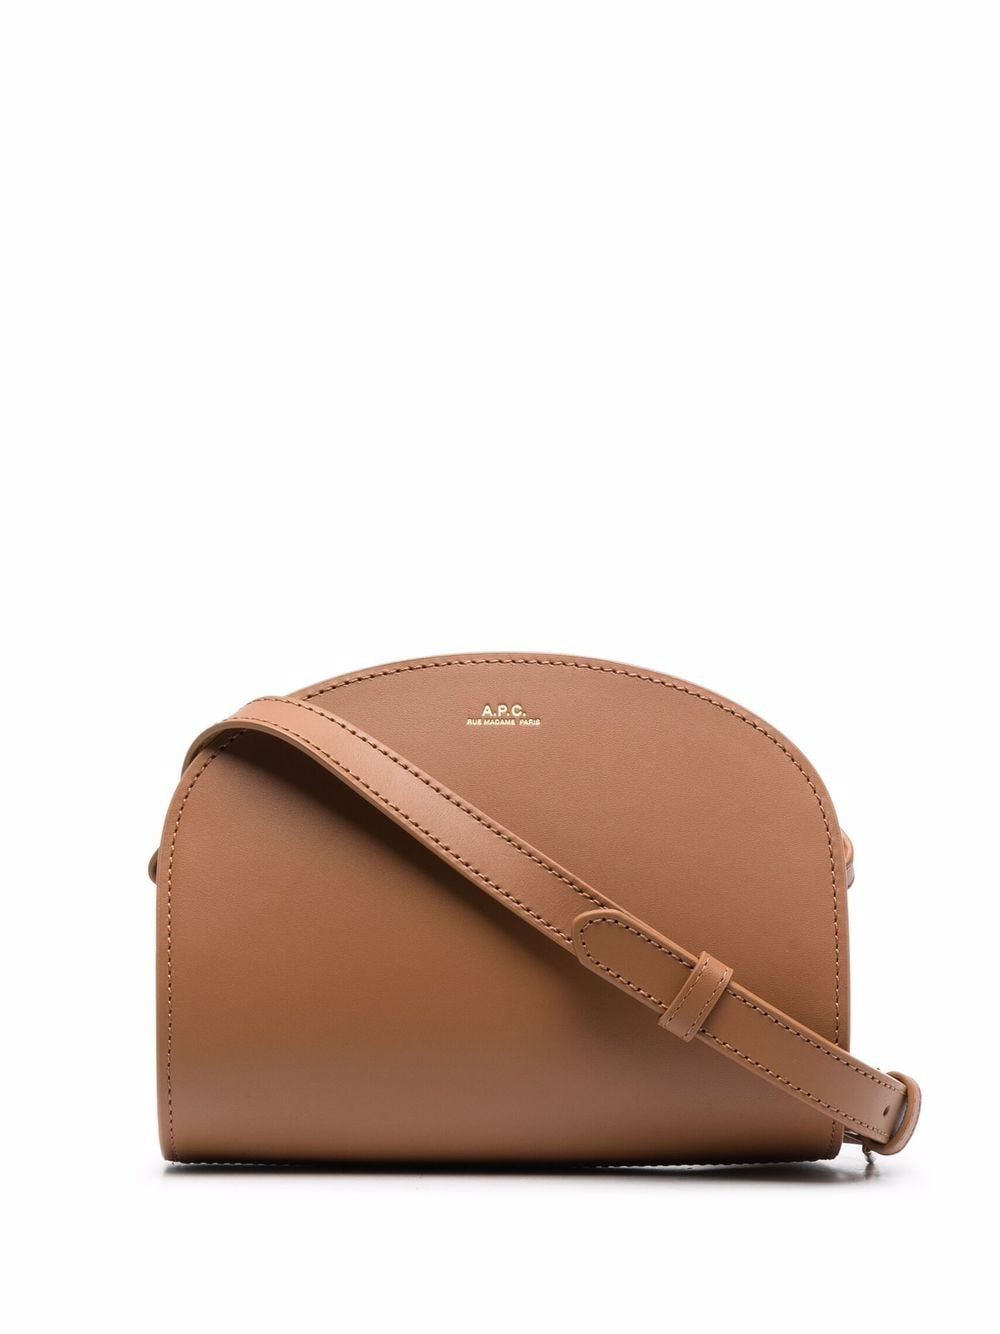 <p class='small-title'>A.P.C.</p>Small Demi Lune Shoulder Bag